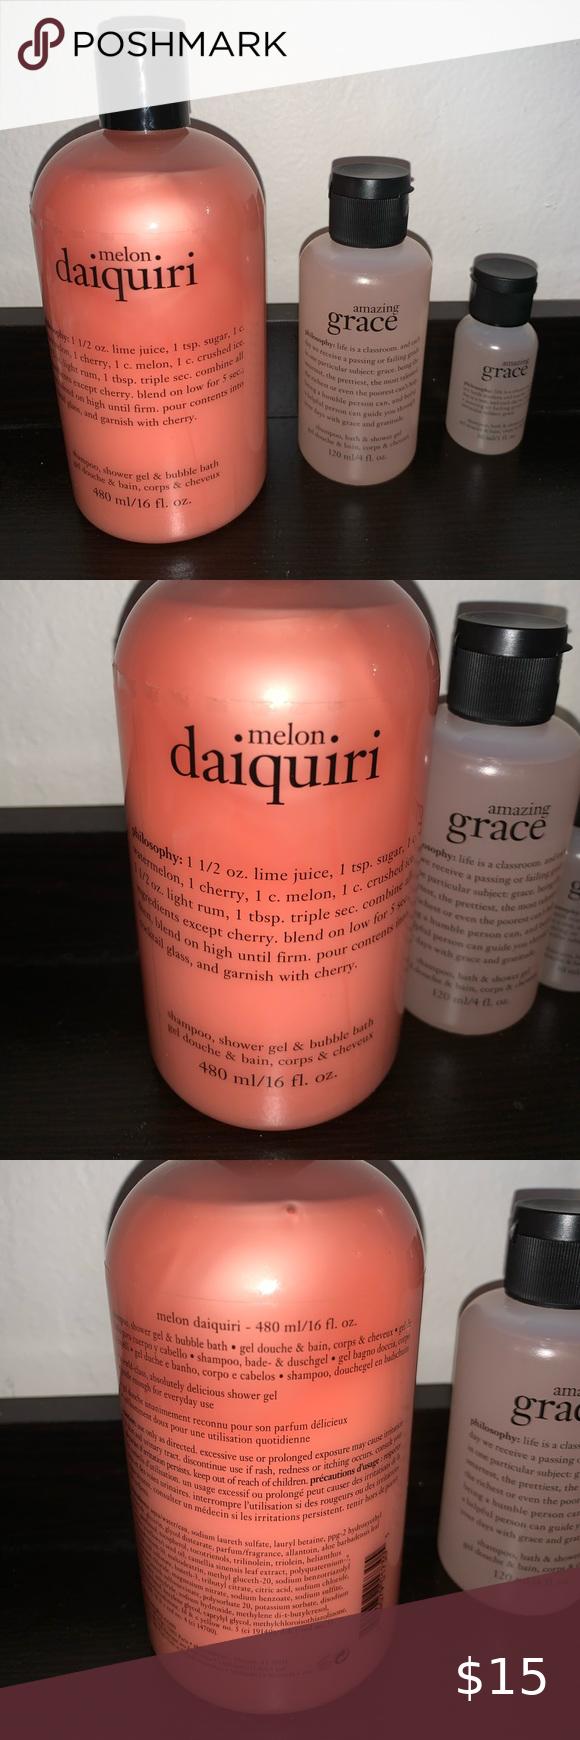 Philosophy Shampoo Shower Gel Bubble Bath Shower Gel Gel Bubble Bath